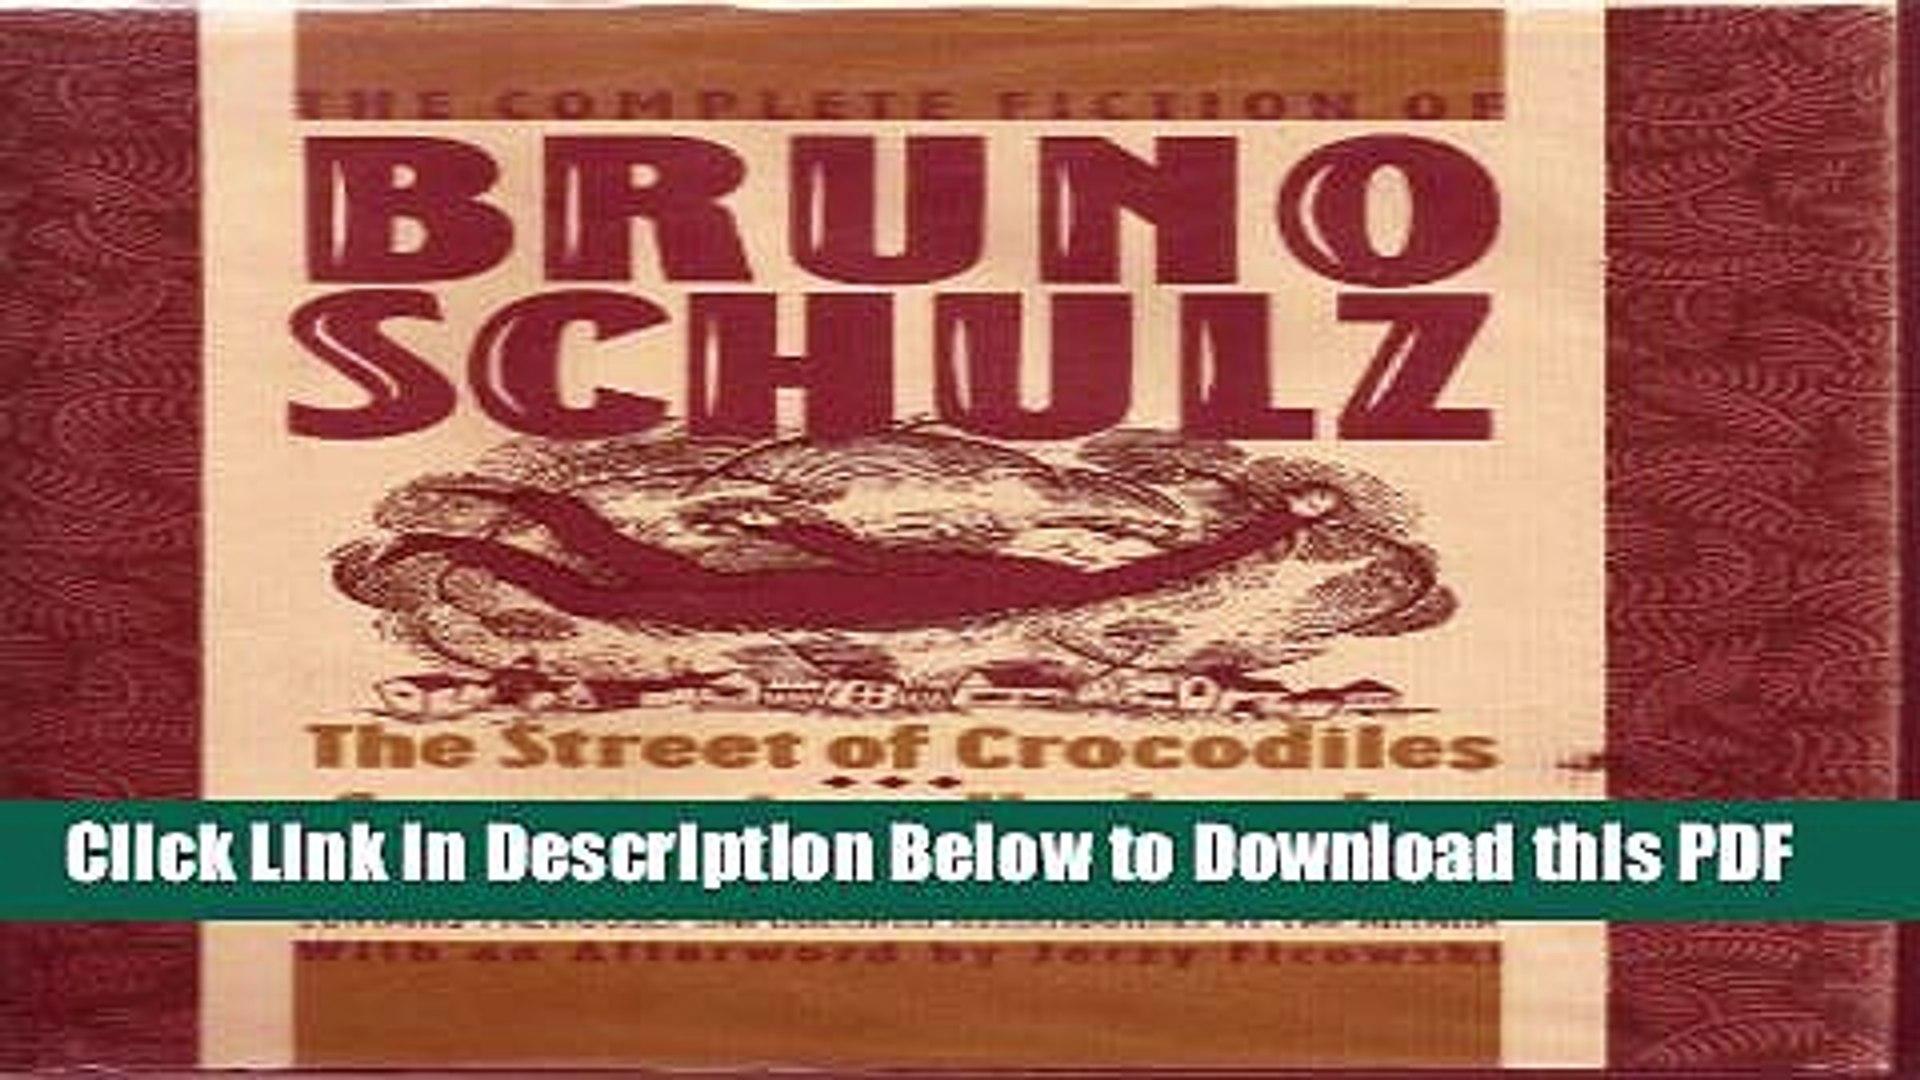 Bruno schulz the street of crocodiles pdf